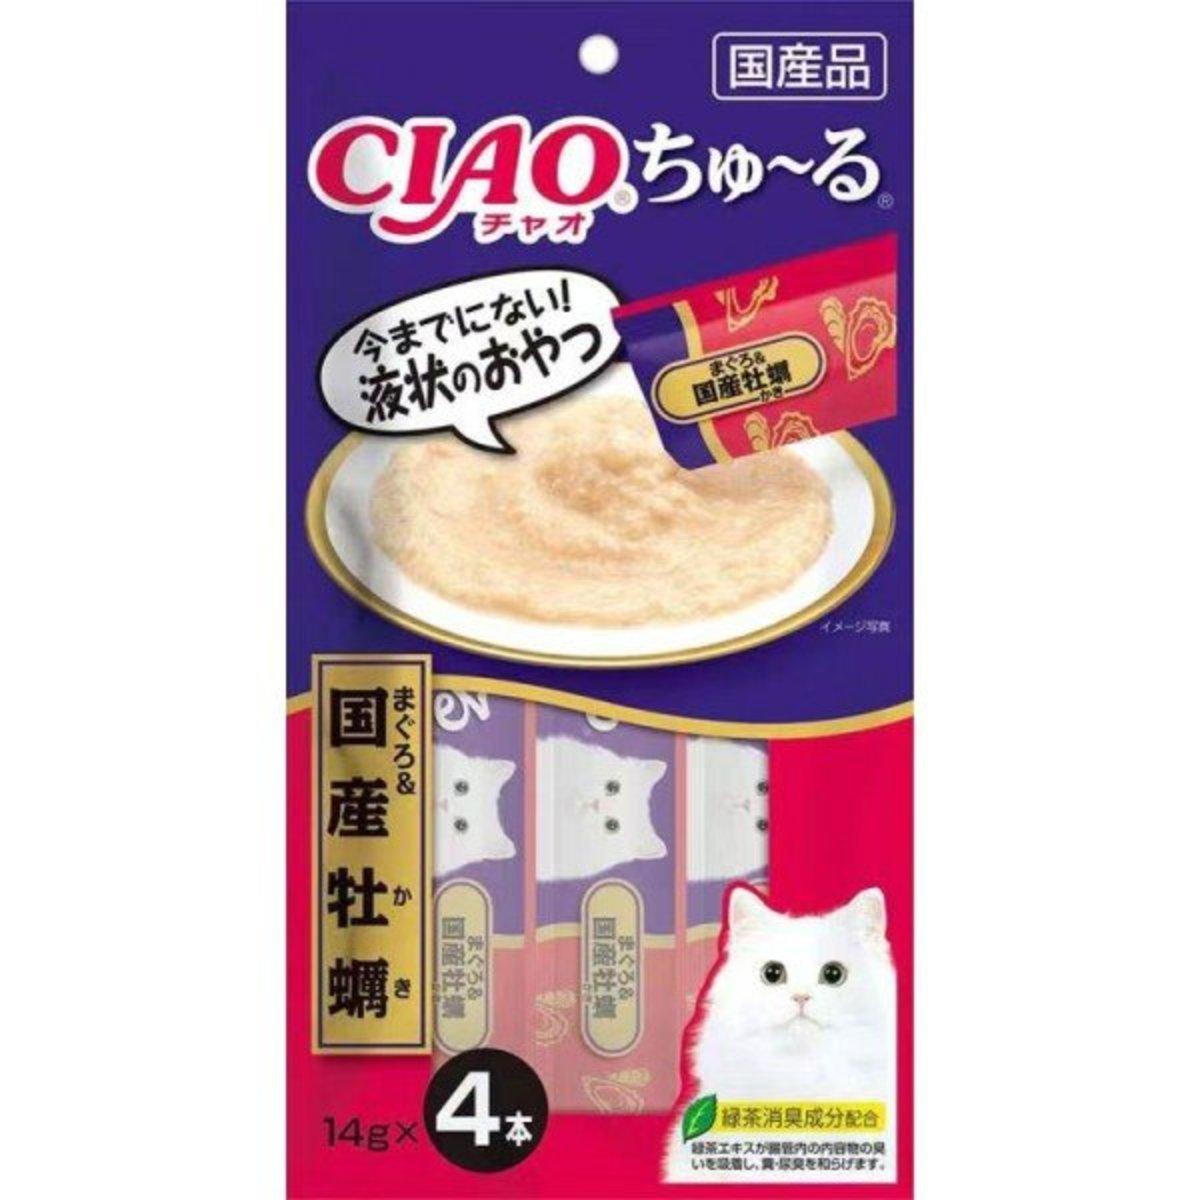 CIAO Churu Tuna & Japenese Oyster Puree (14g x 4) #SC-110